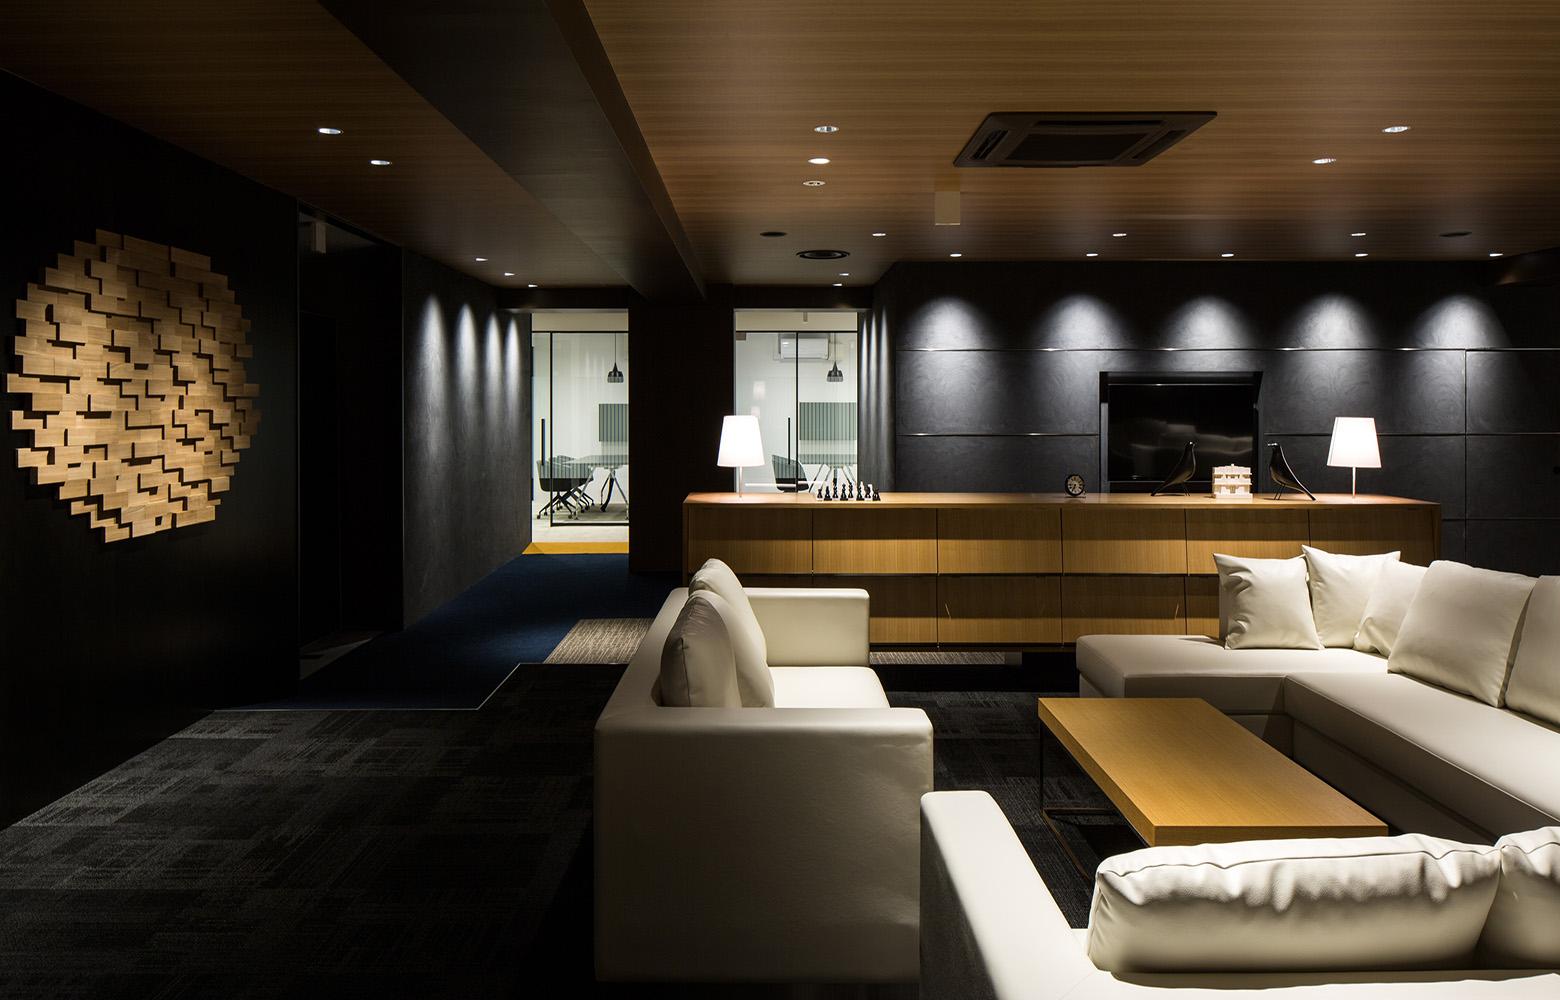 Secret Office Lounge_3 デザイン・レイアウト事例